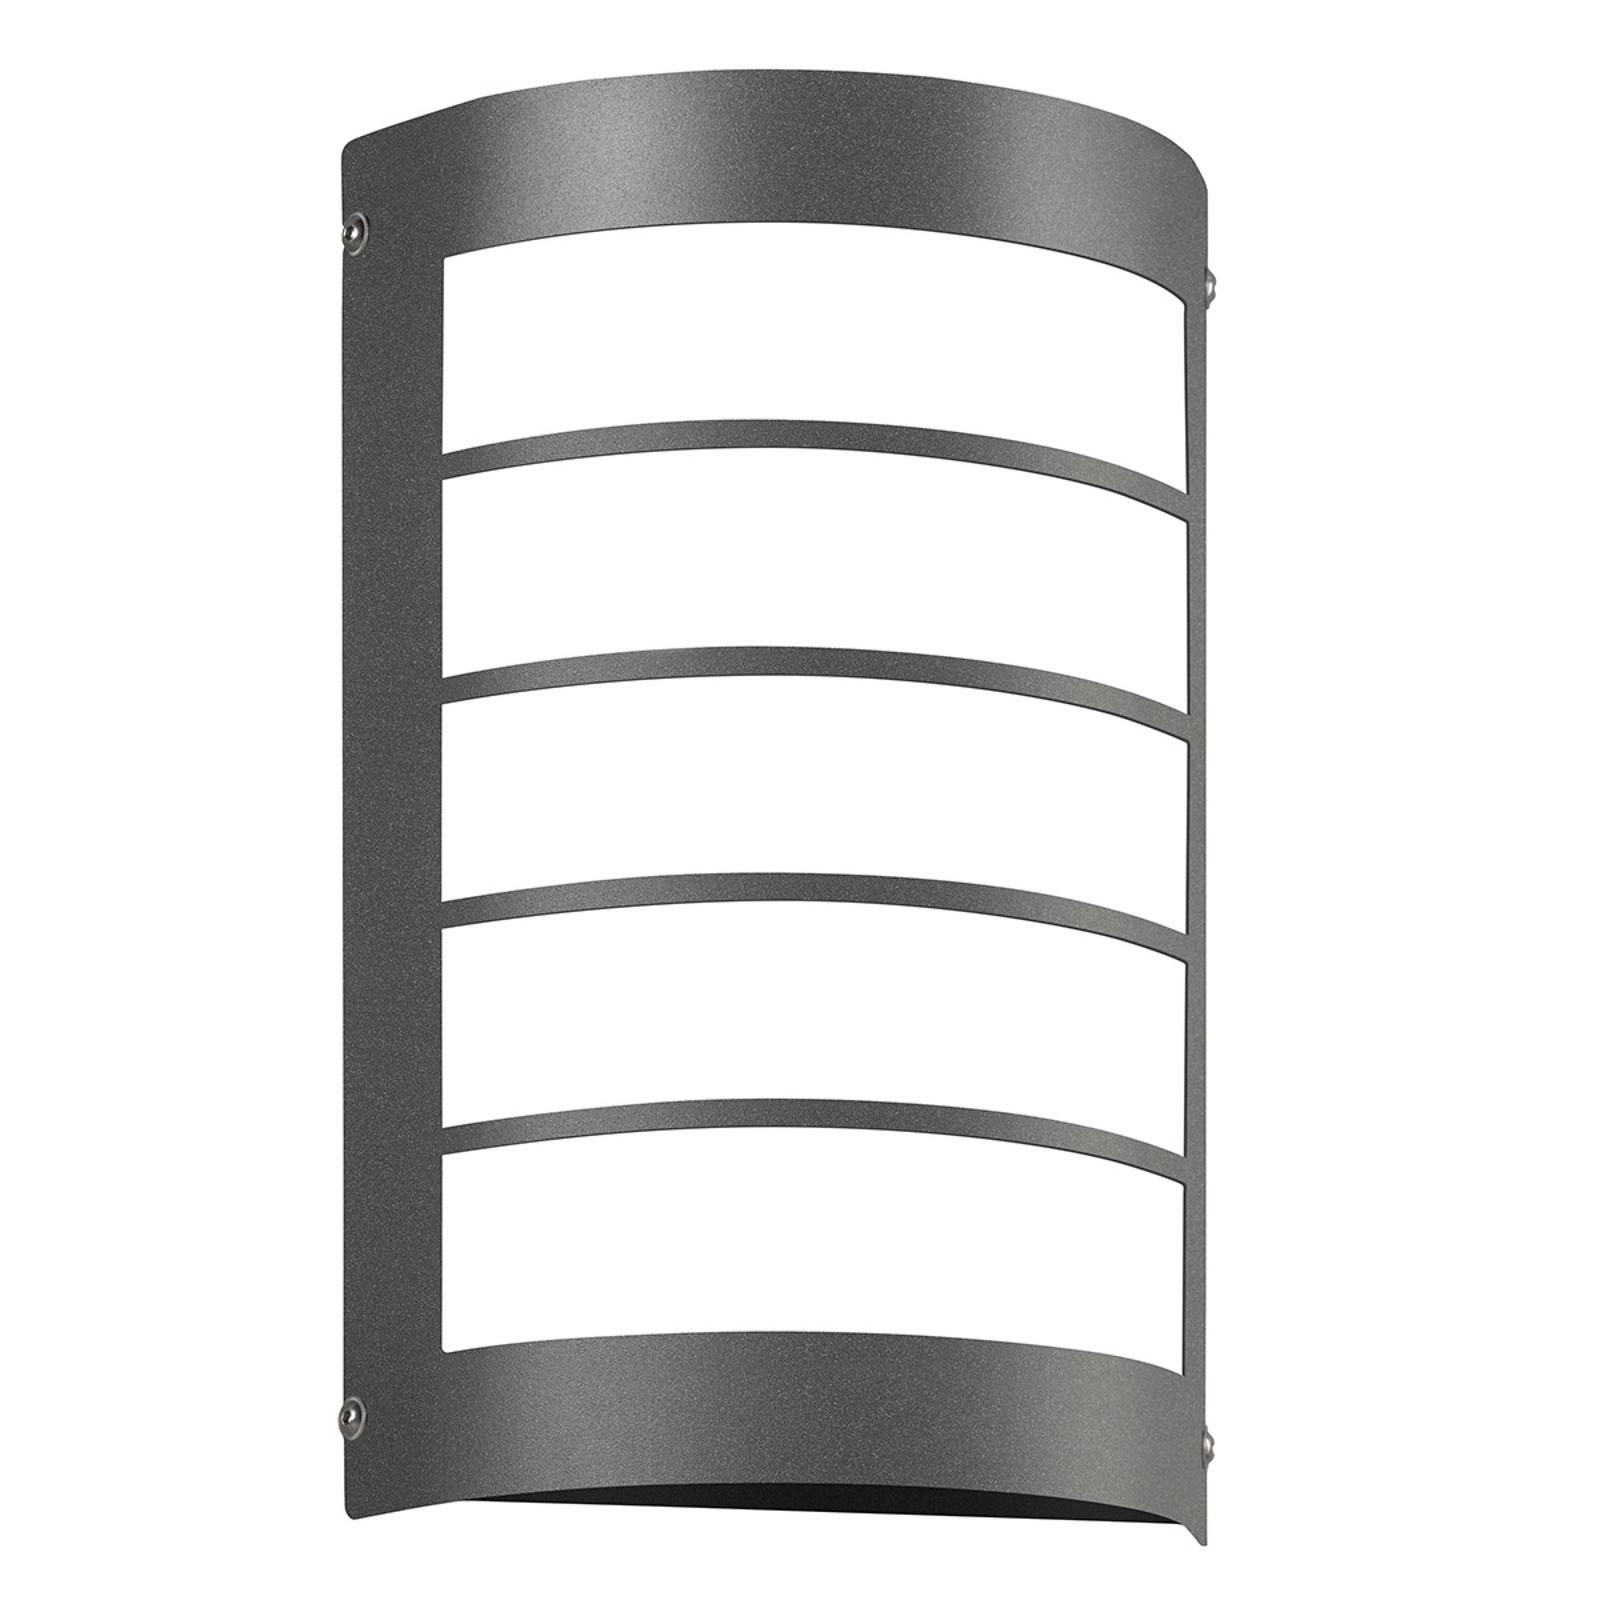 LED buitenwandlamp Aqua Marco, antraciet